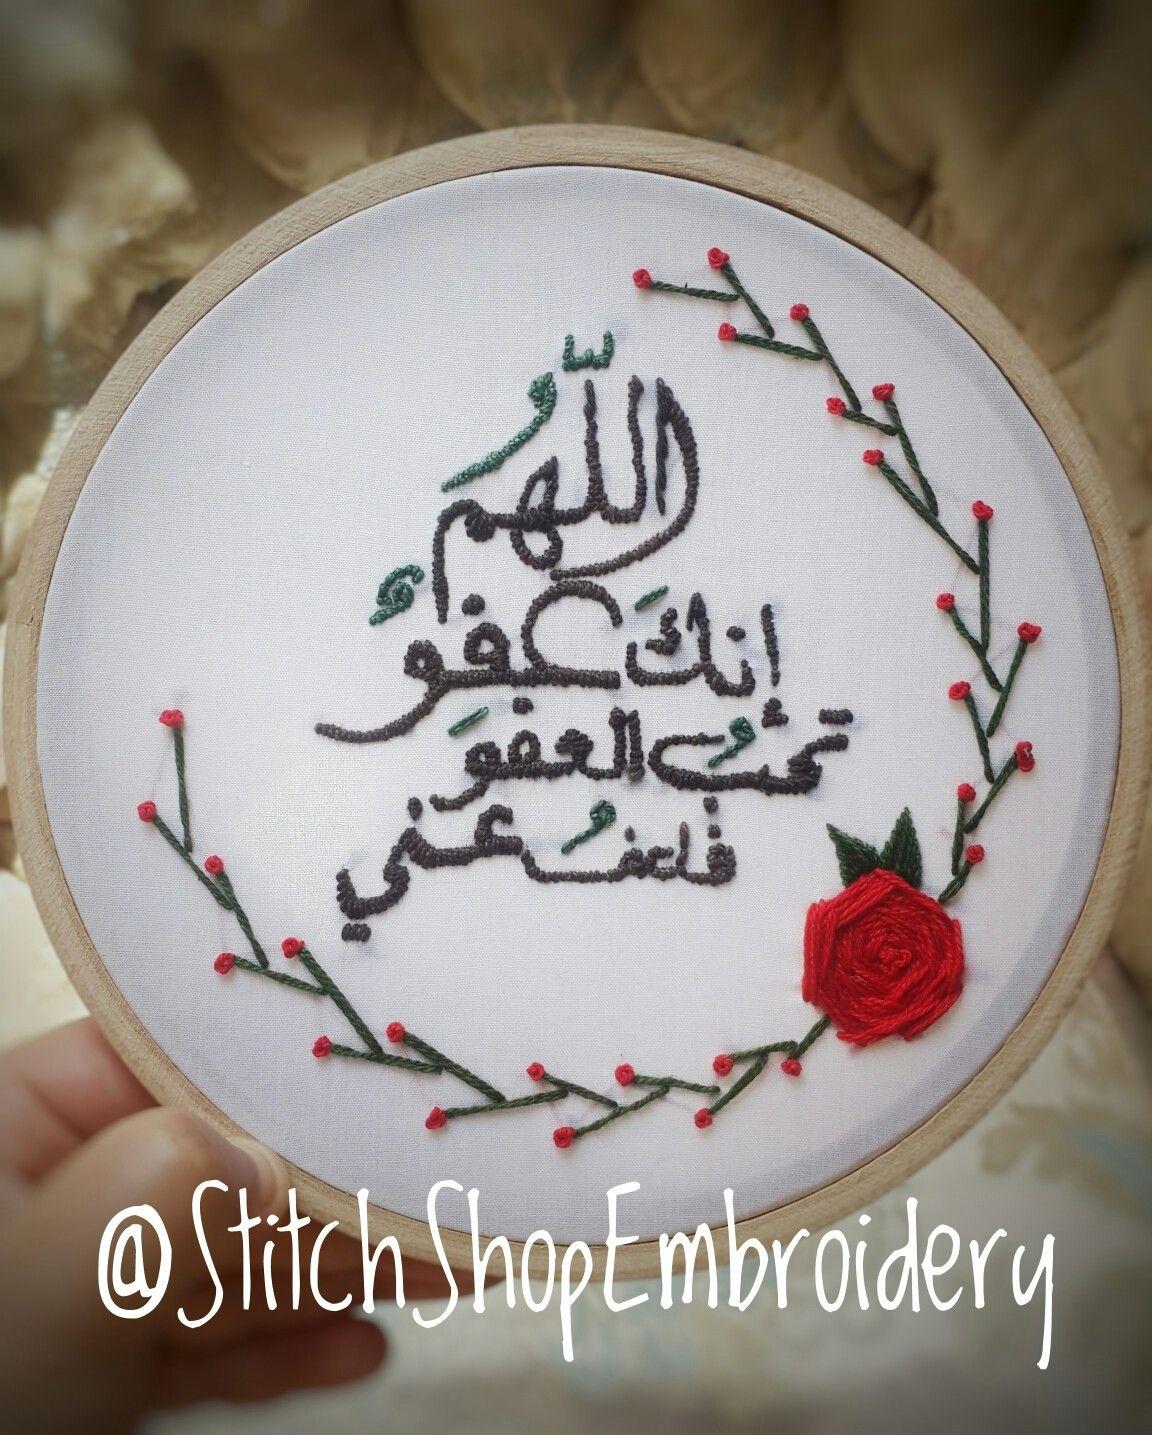 اللهم انك عفو تحب العفو فاعف عني Embroidery Embroideryart Embroiderypattern Embroideryhoo Embroidery Flowers Pattern Embroidery Flowers Flower Patterns